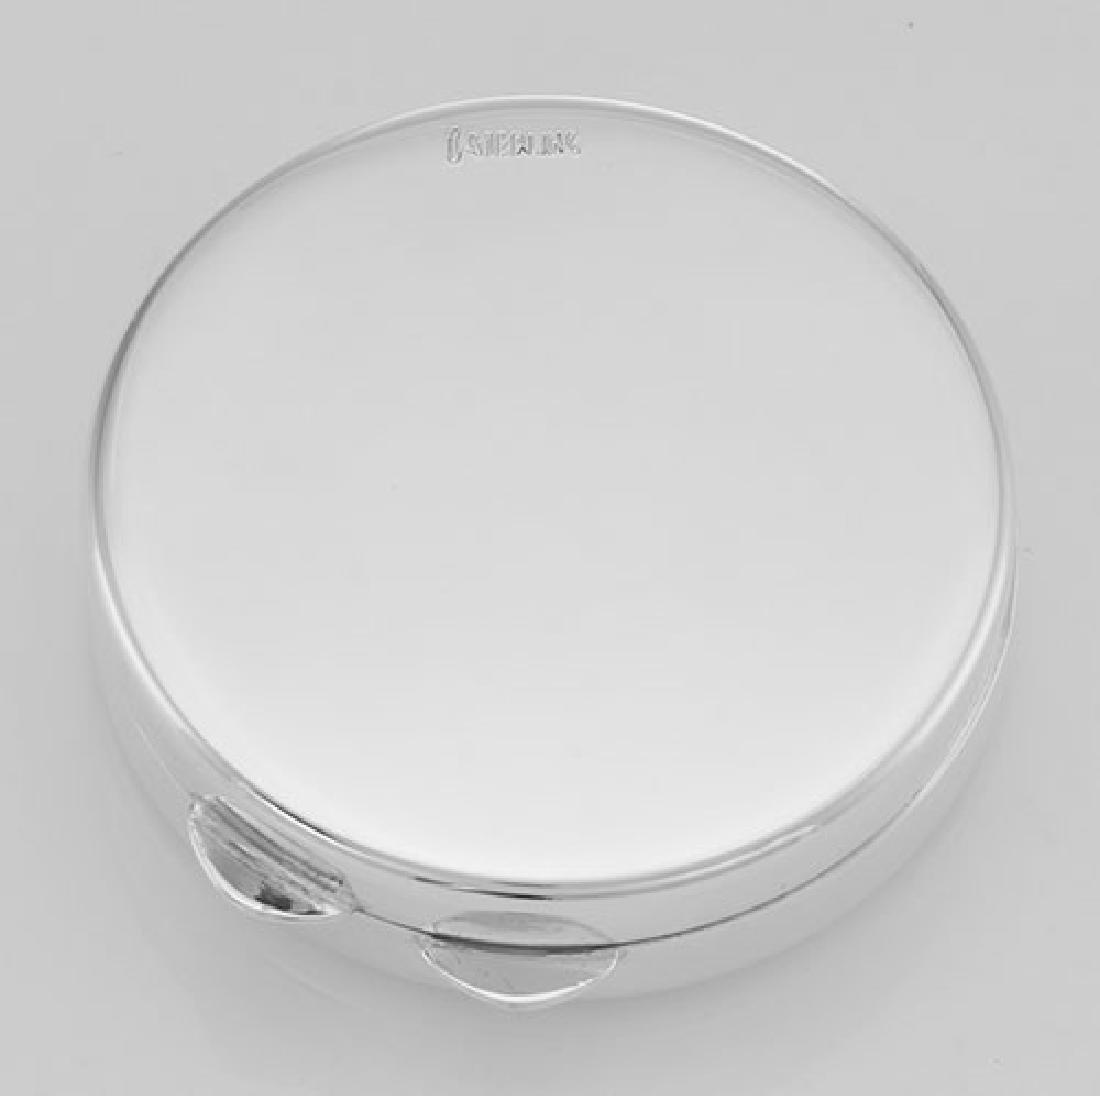 Classic Engravable Sterling Silver Round Engravable Pil - 3